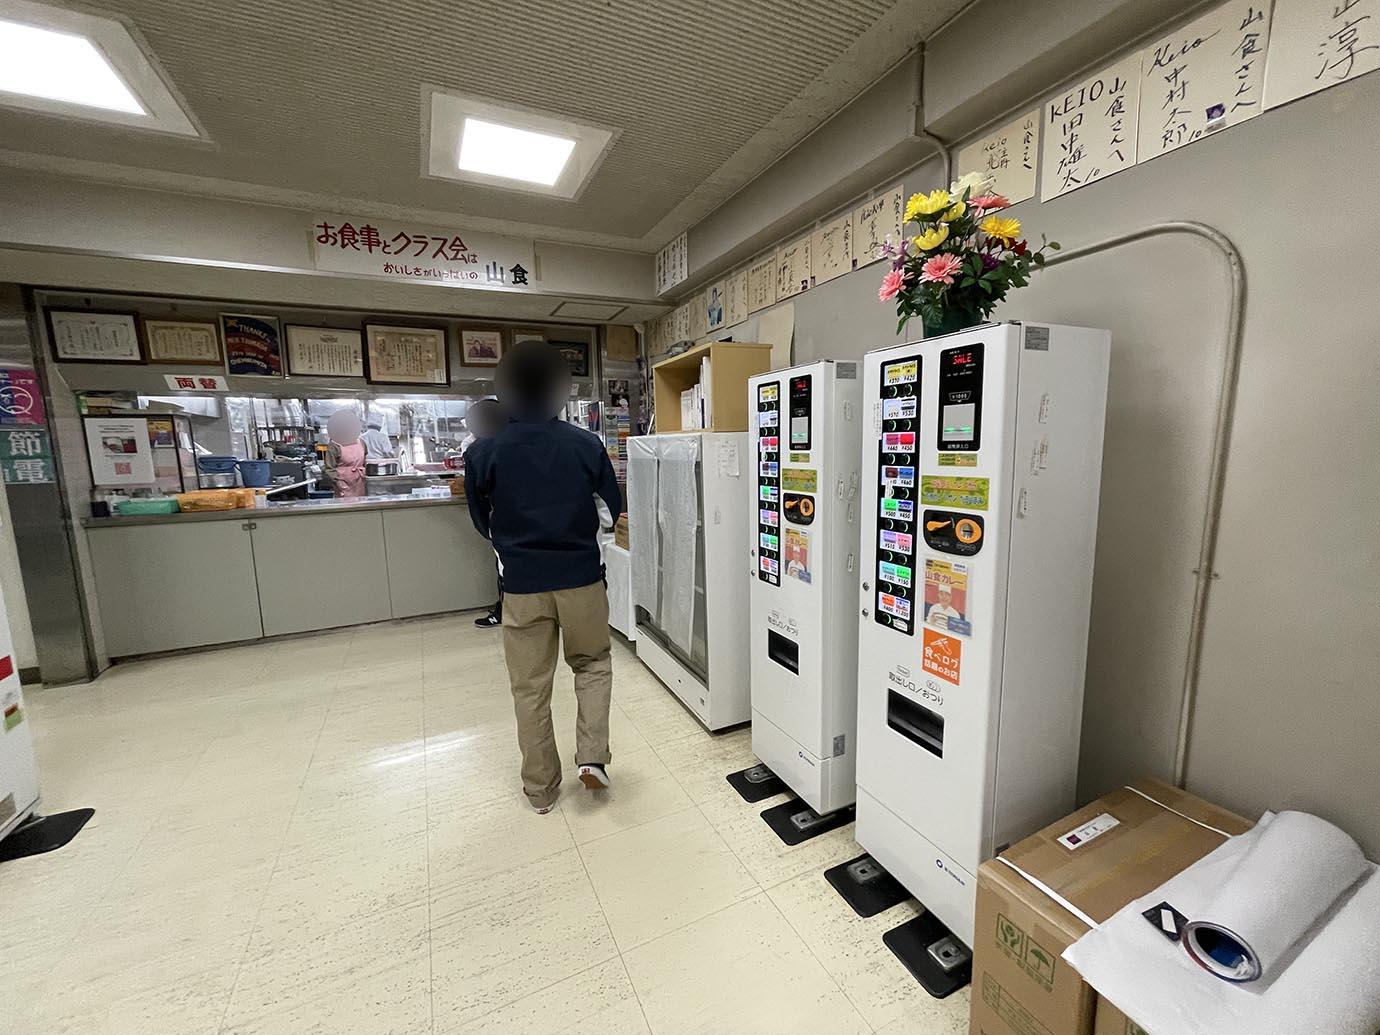 keio-university-cafeteria-pork-cutlet10